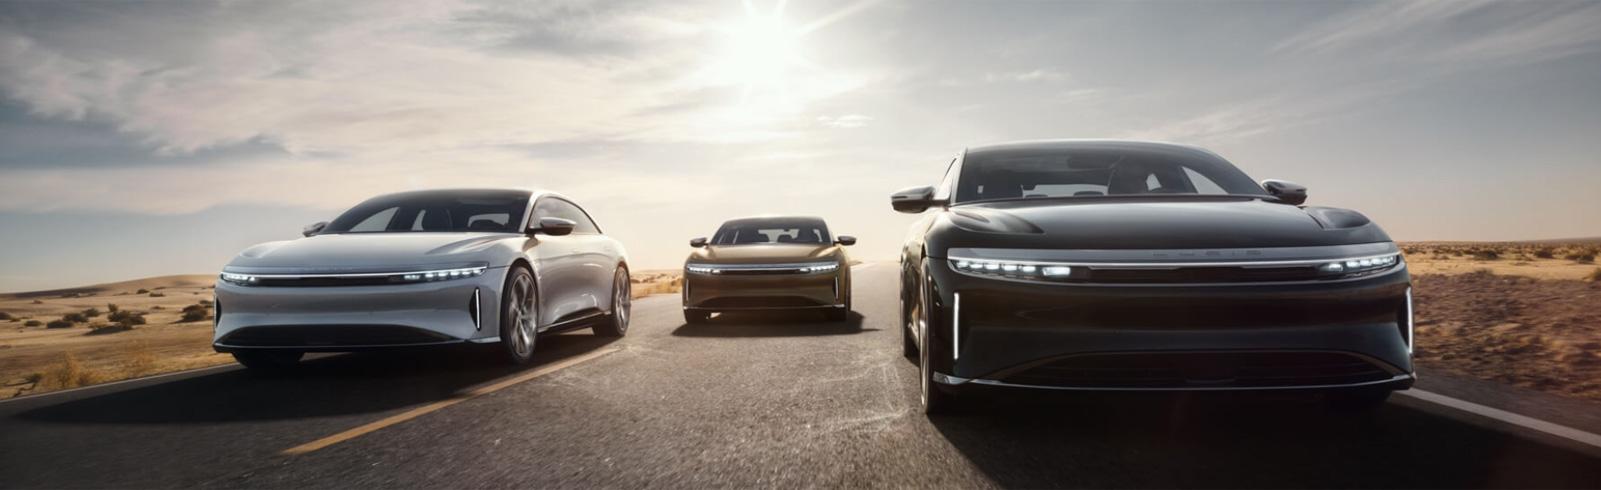 Lucid Motors introduced the Lucid Air all-electric luxury sedan